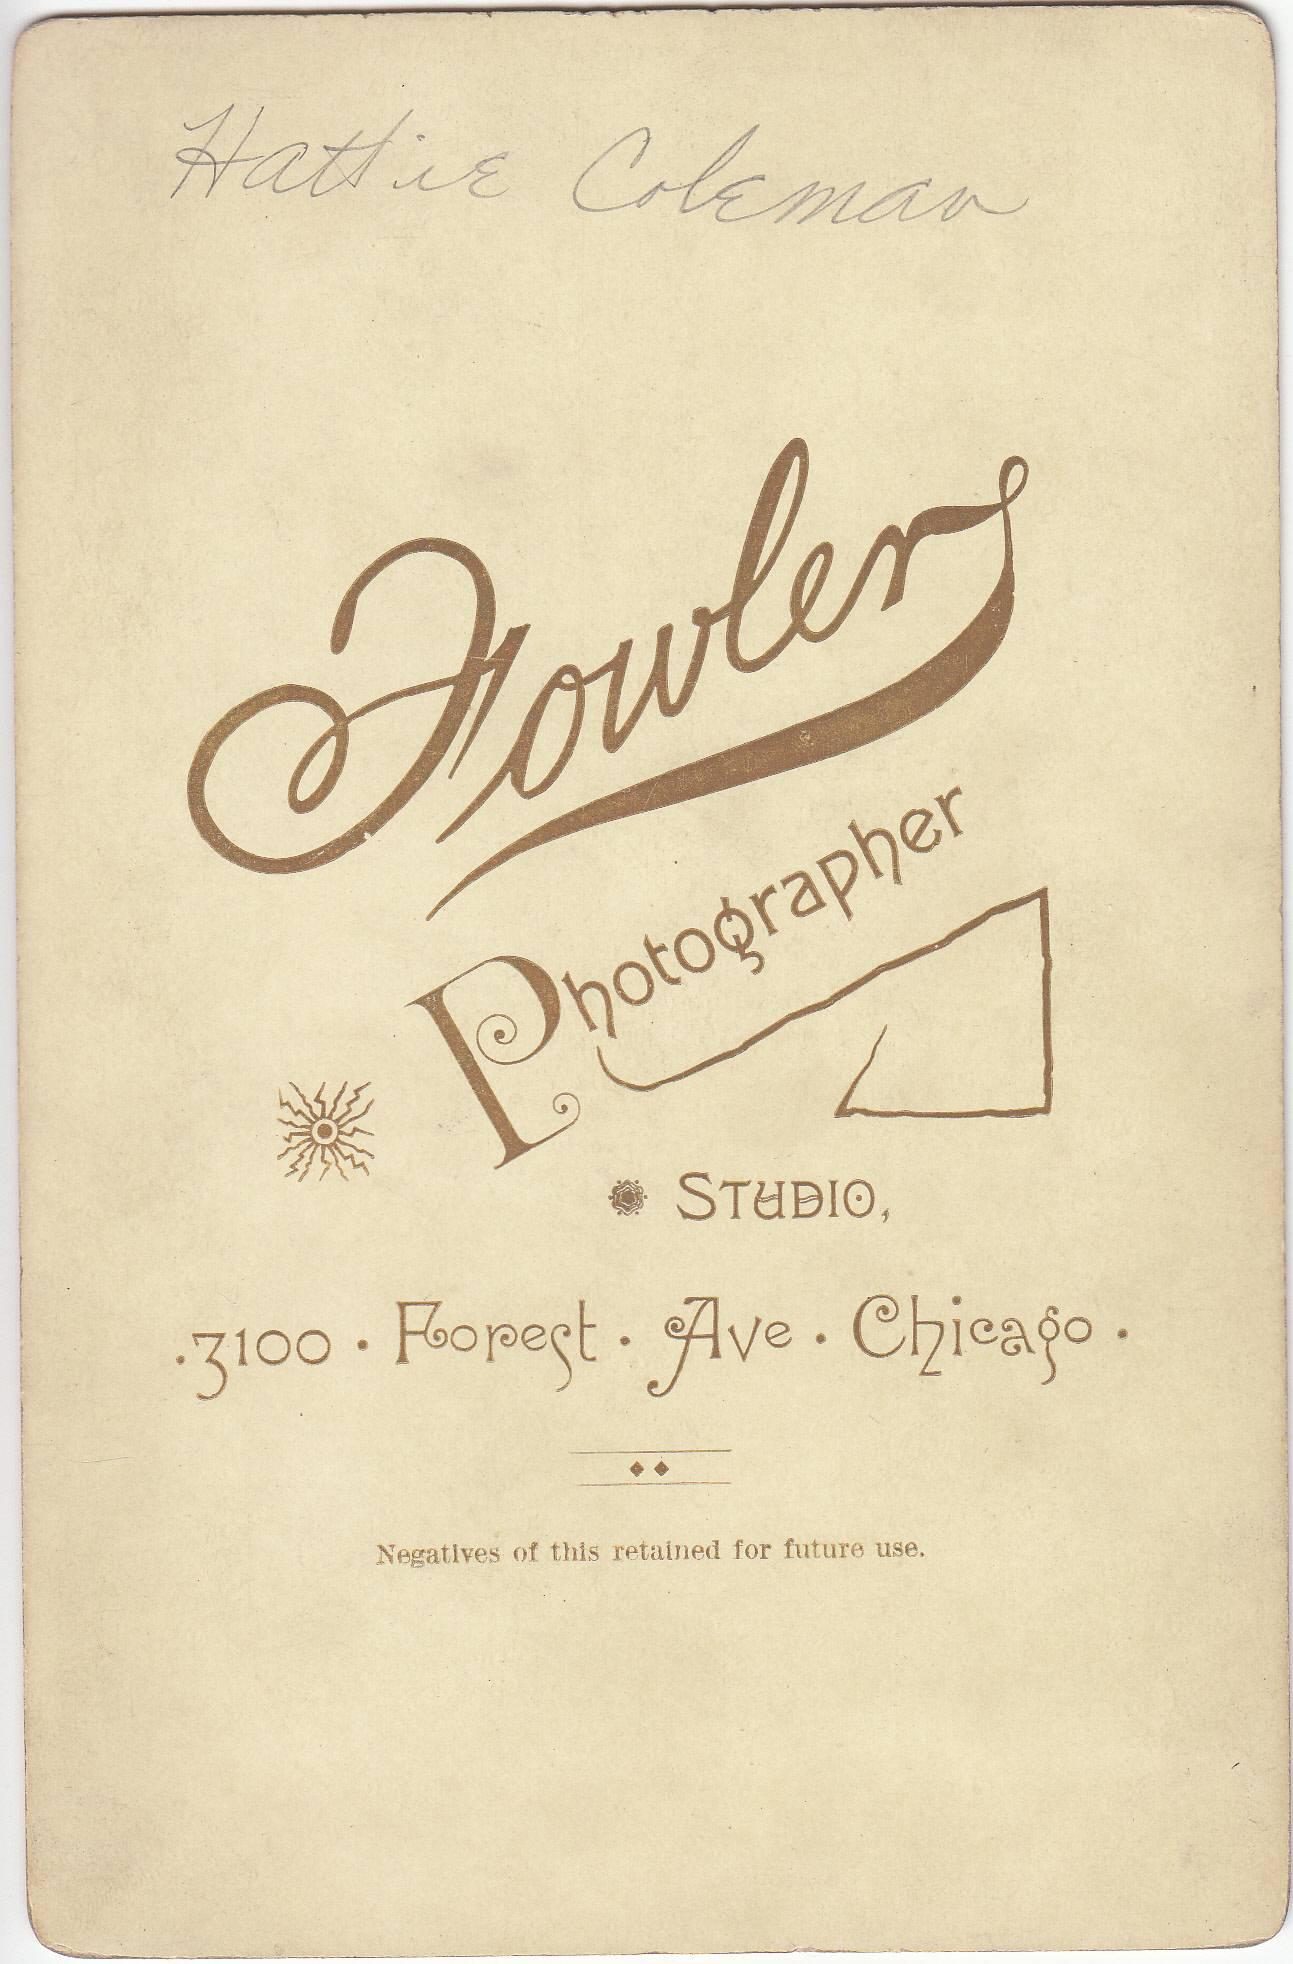 E. L. Fowler, photographer of Chicago, IL - back